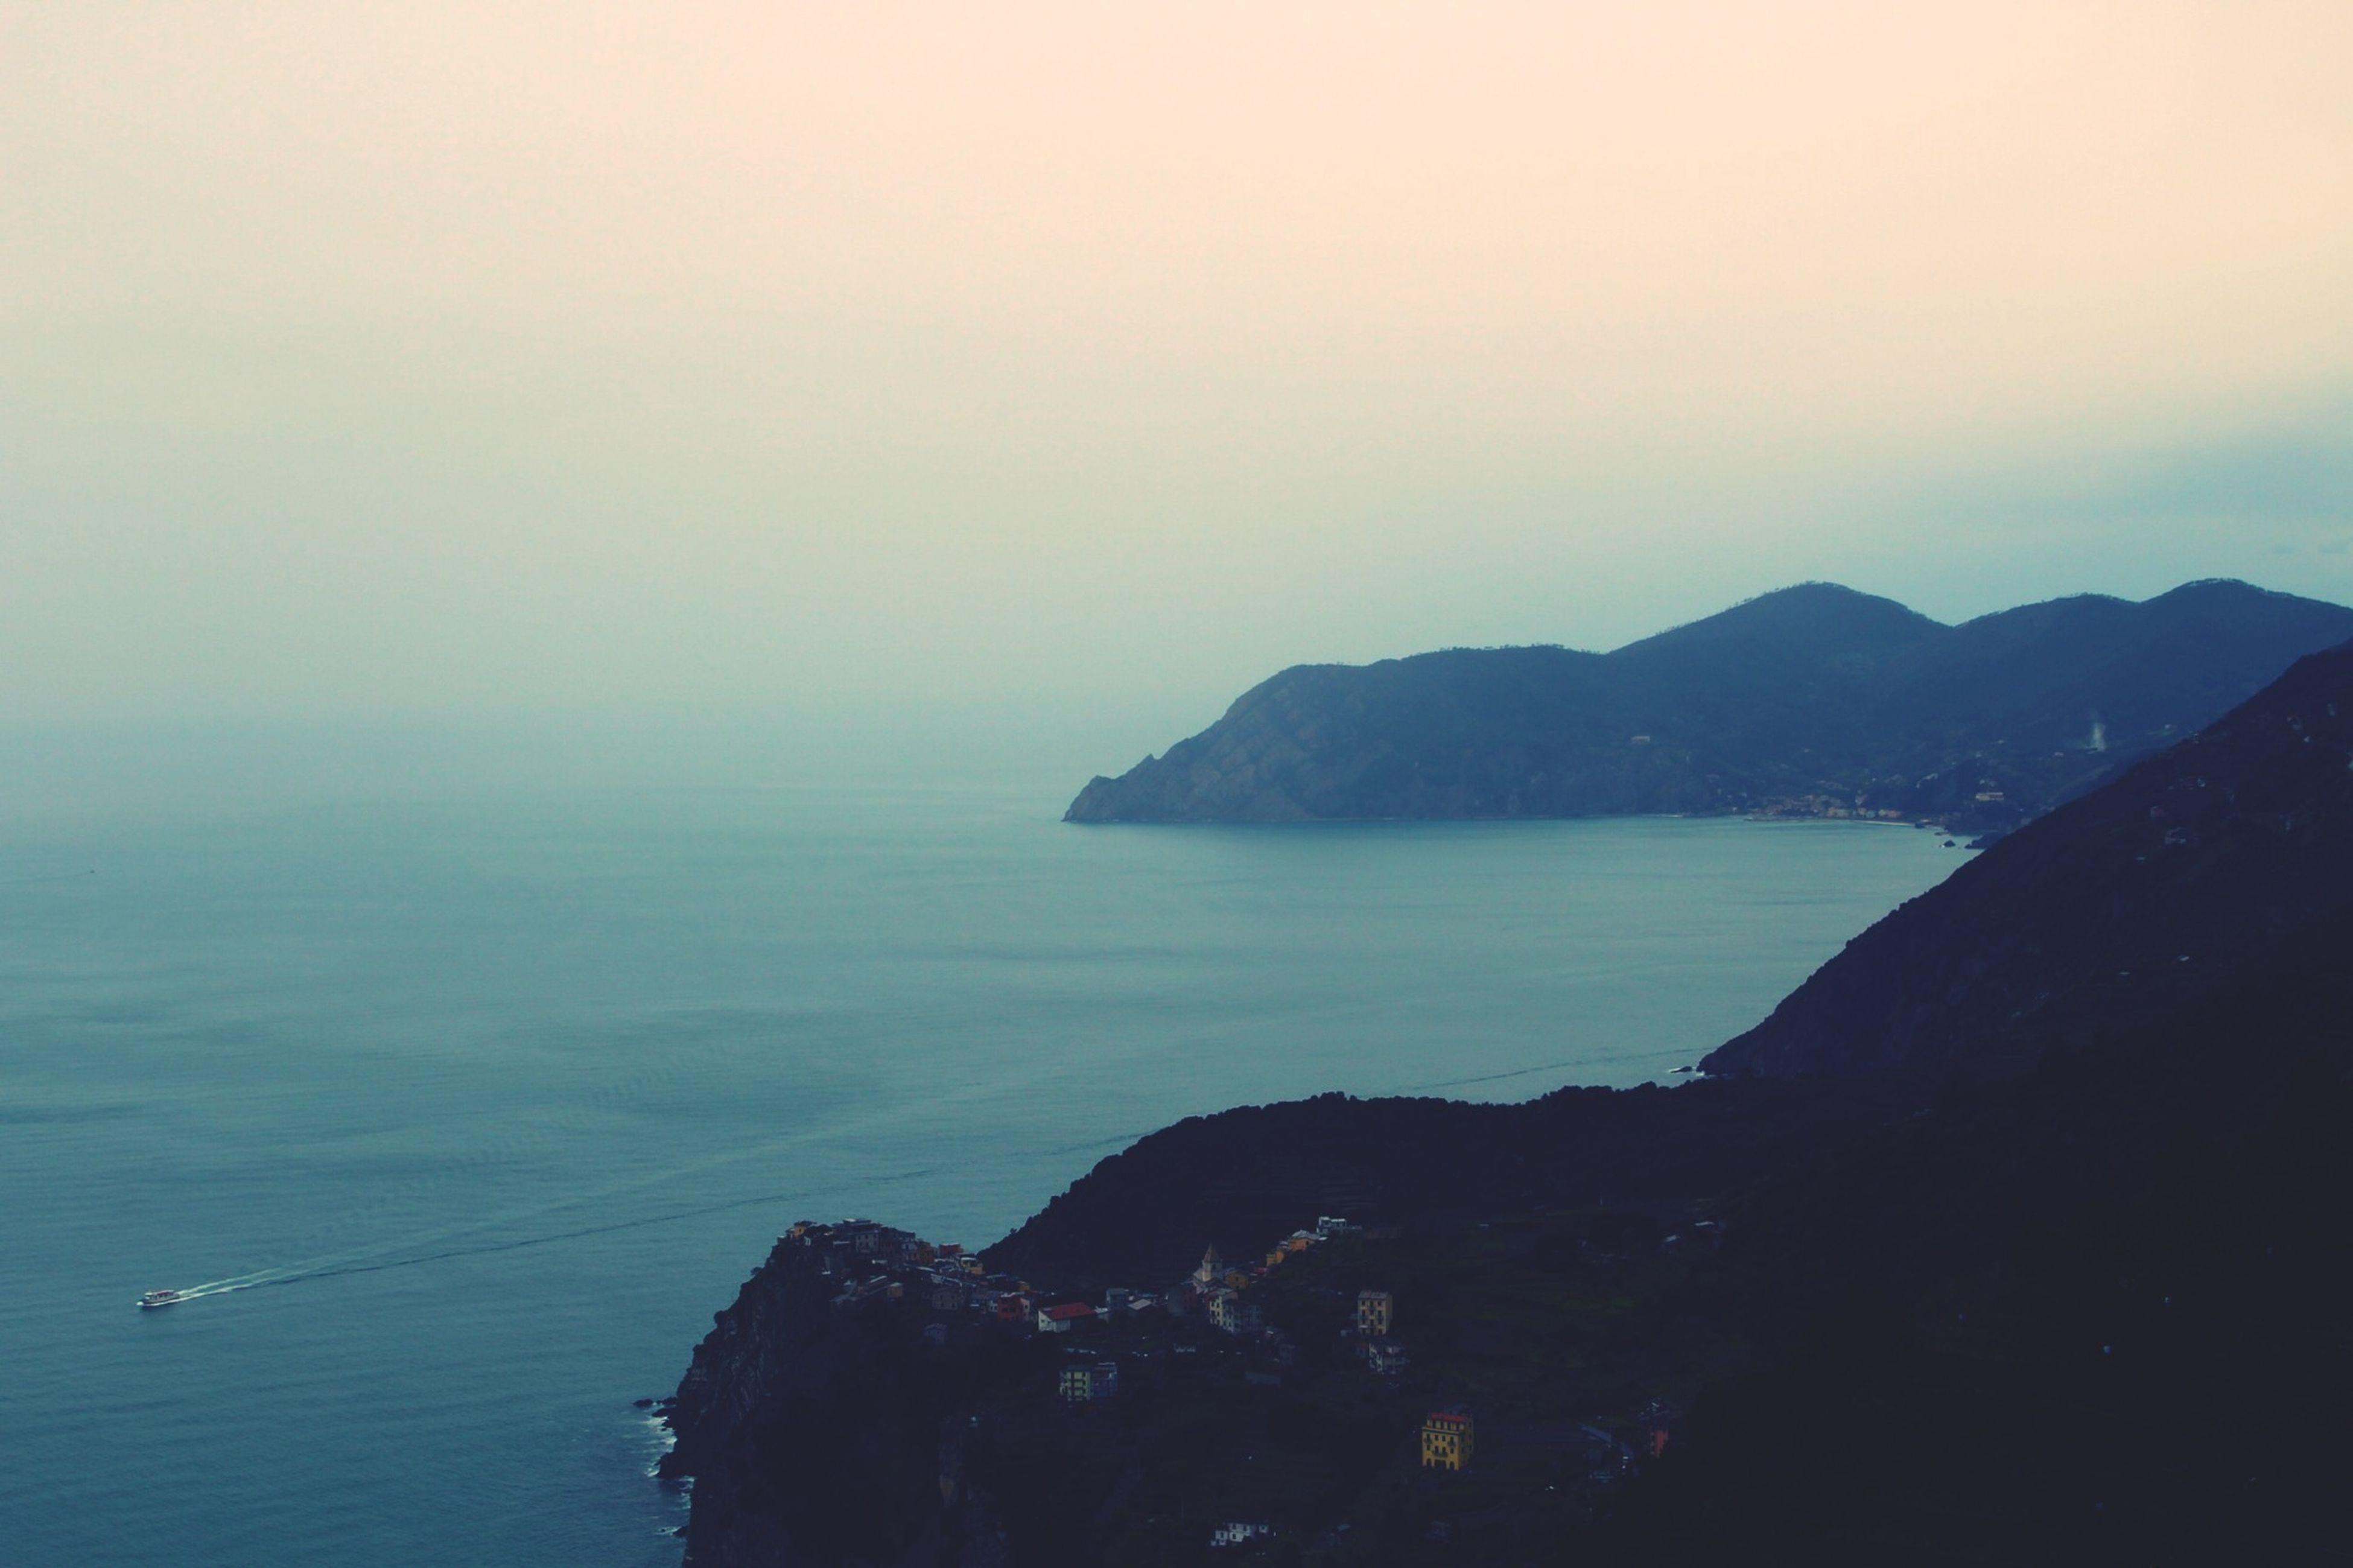 Rocks and calm blue sea against clear sky